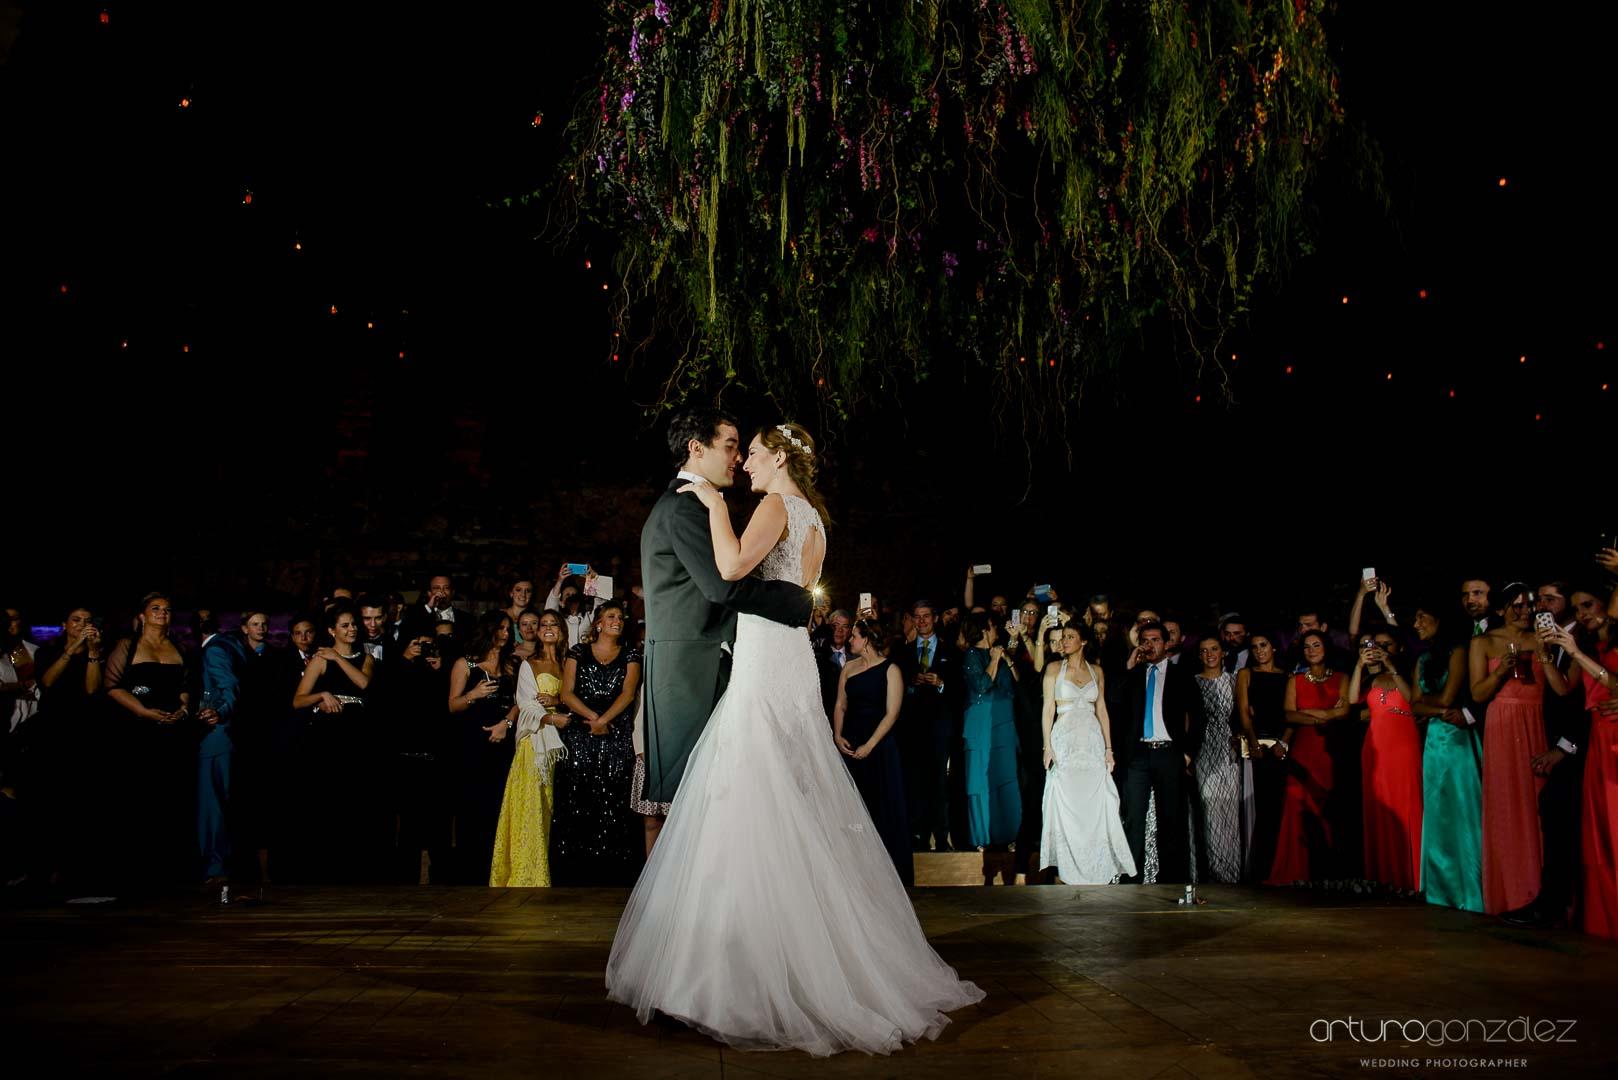 fotografo-de-bodas-en-guanajuato-109